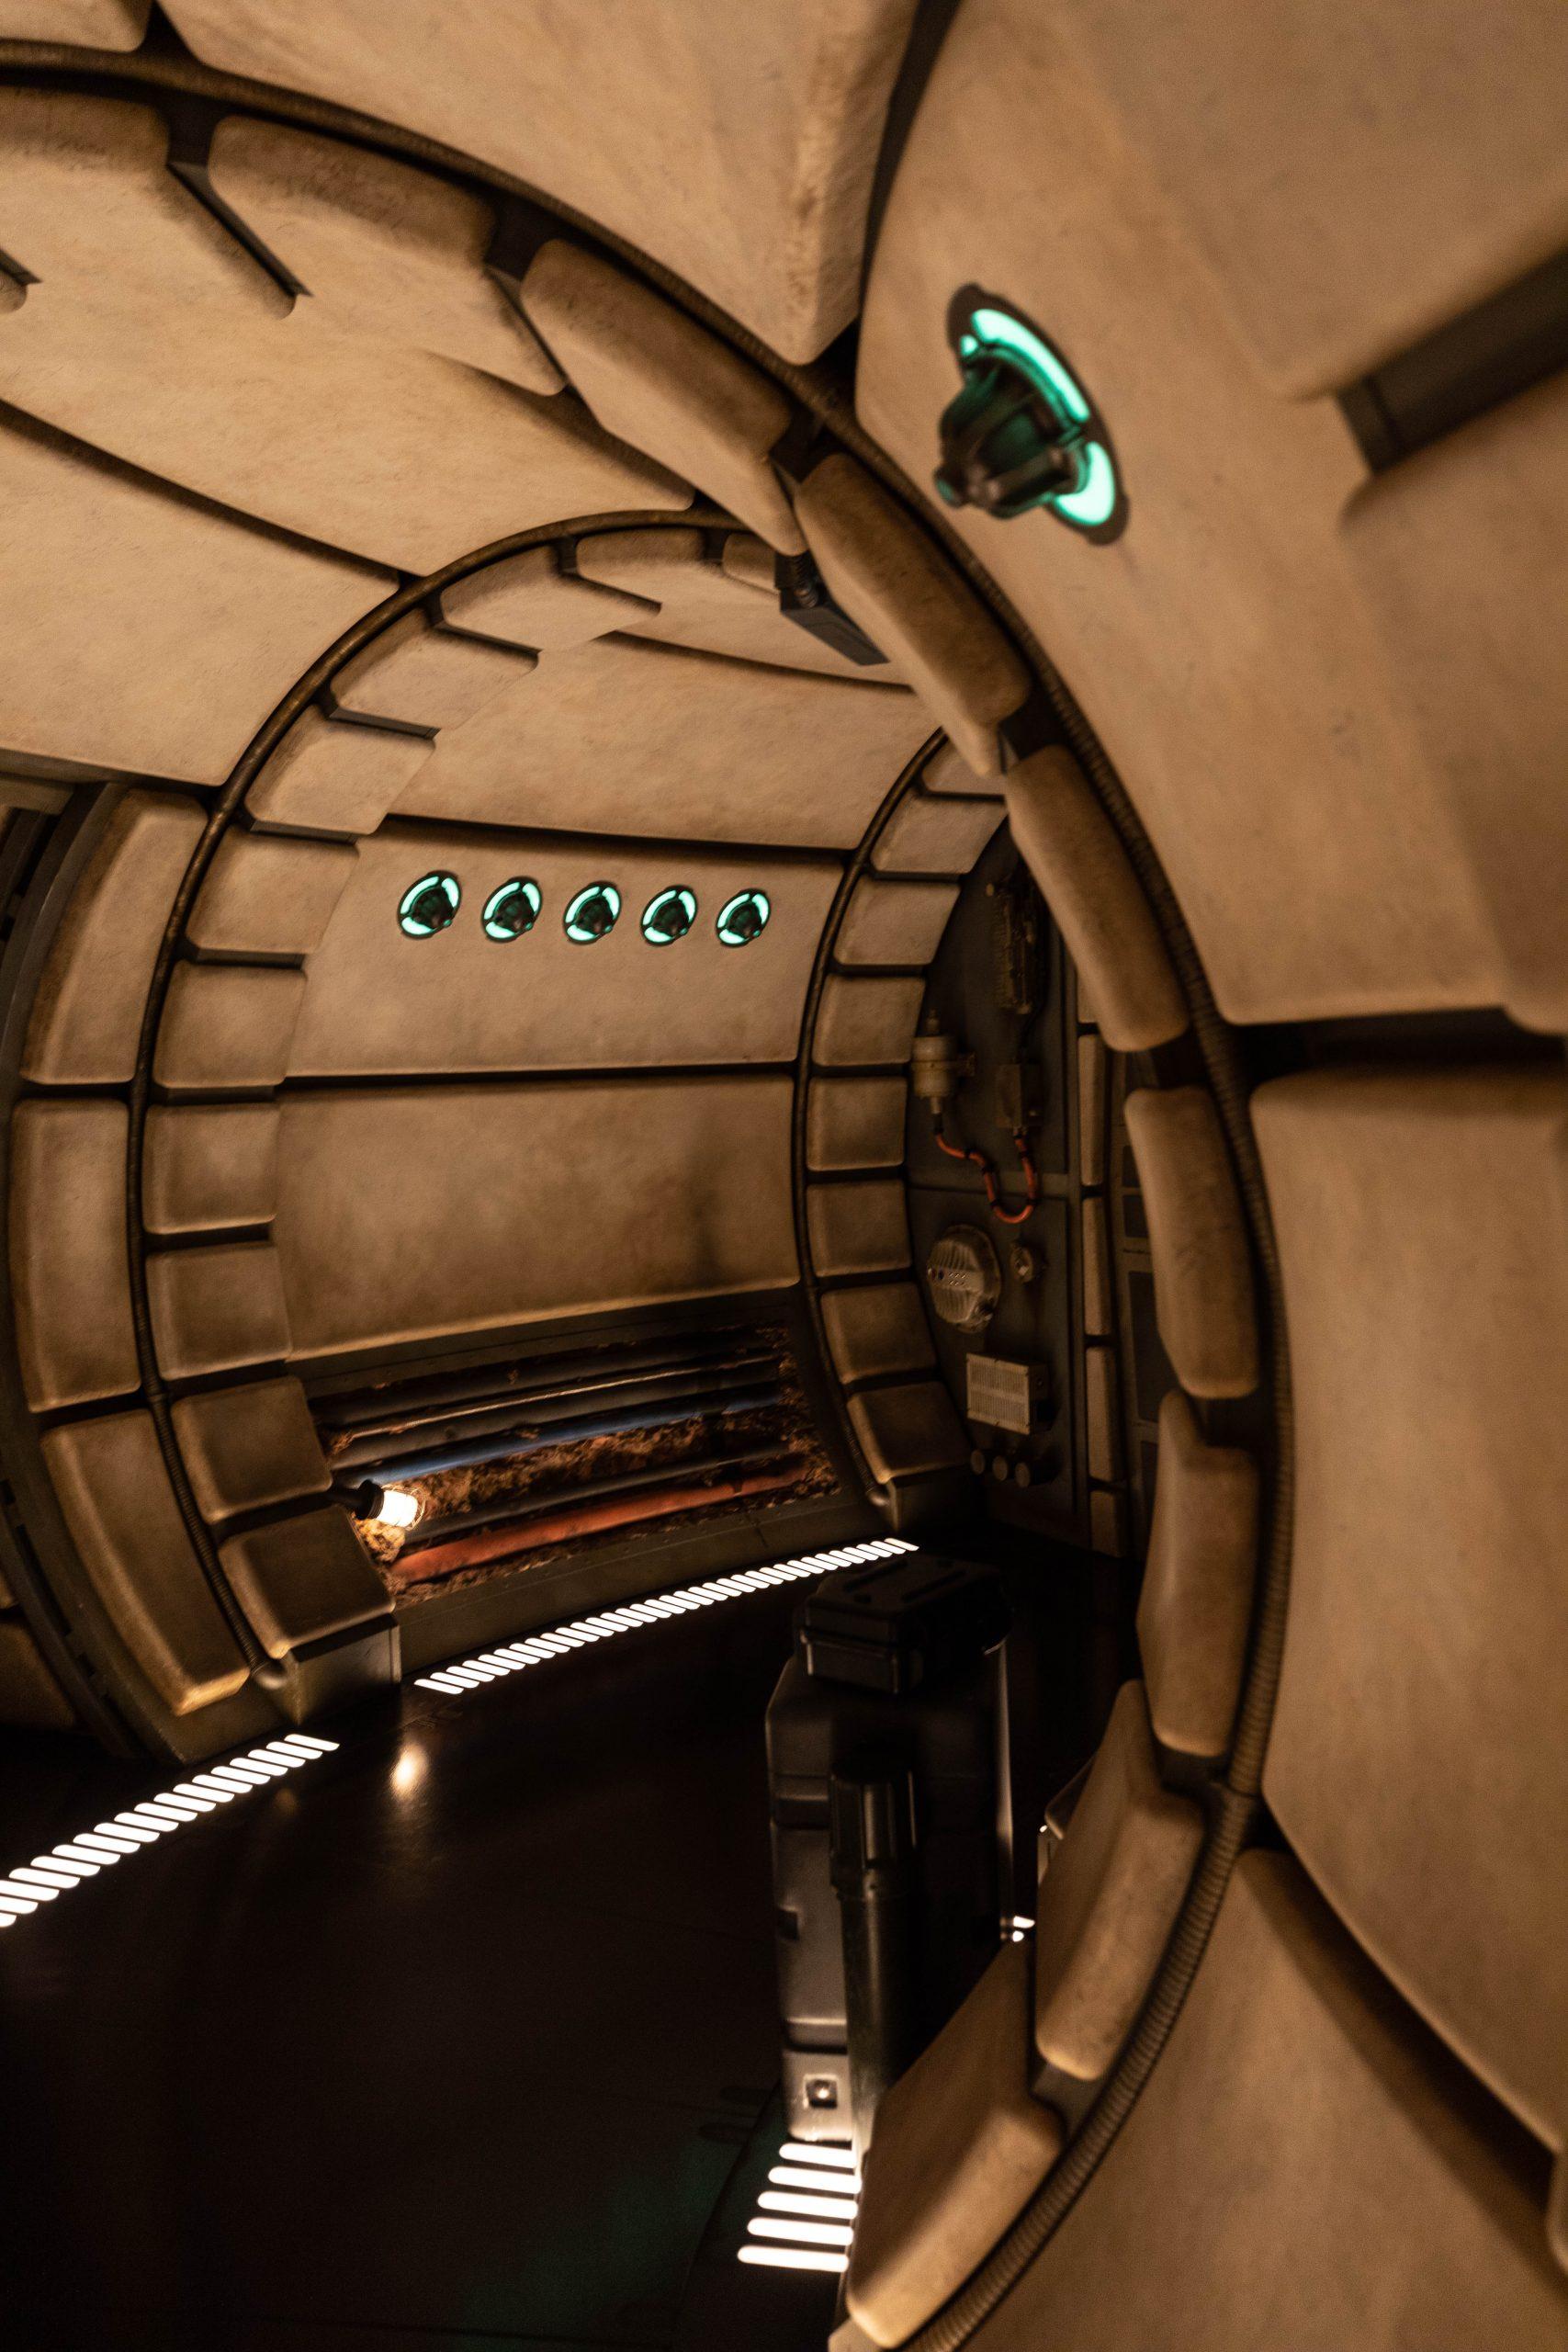 Millenium Force: Smugglers Run Star Wars: Galaxy's Edge Hollywood Studios Walt Disney World Photographed by Annie Fairfax